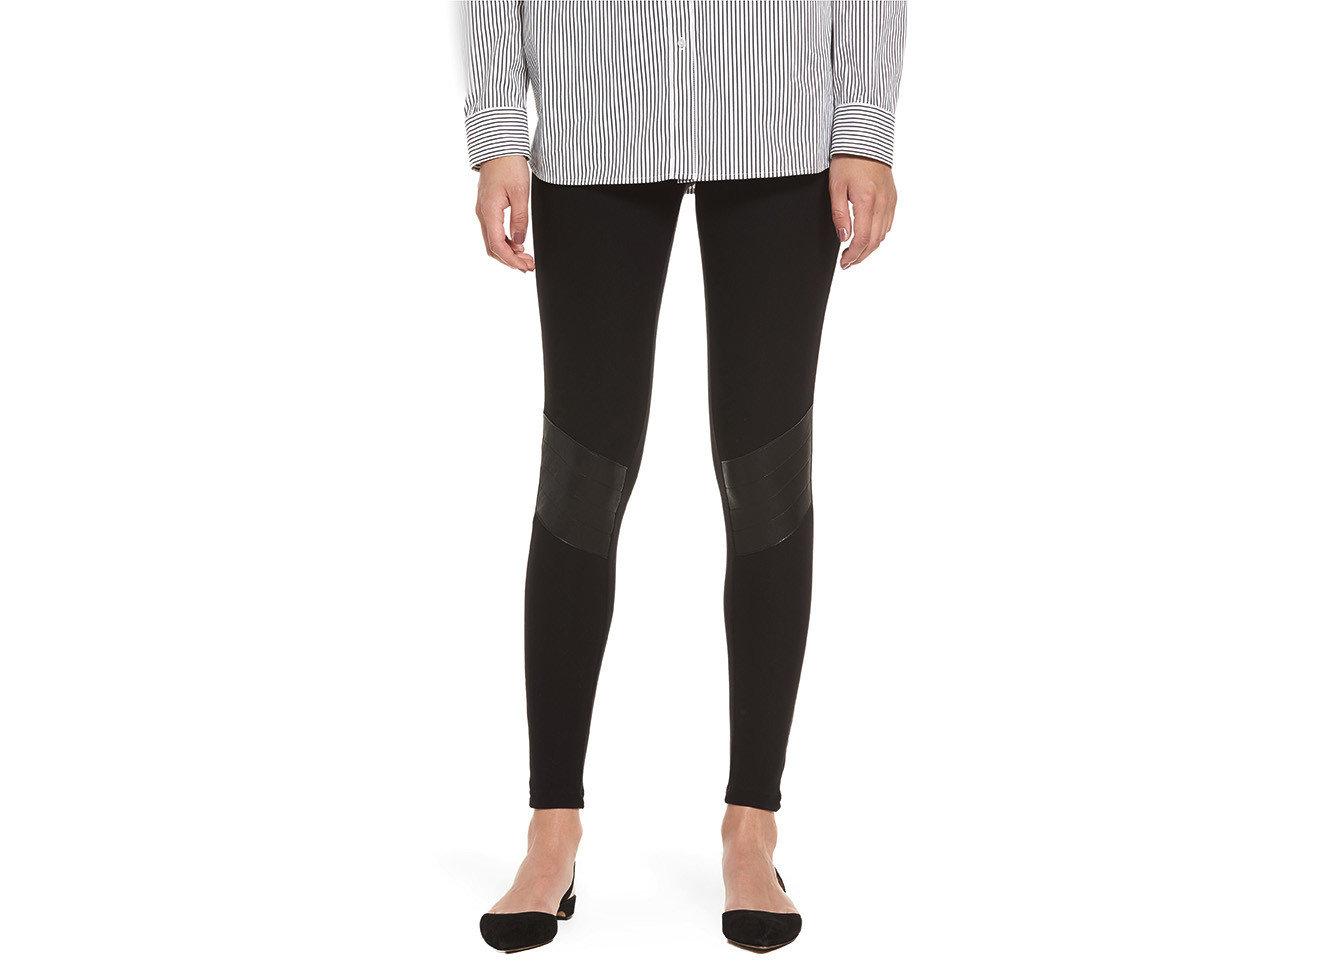 Style + Design Travel Shop clothing leggings tights trouser waist trousers active pants human leg jeans posing